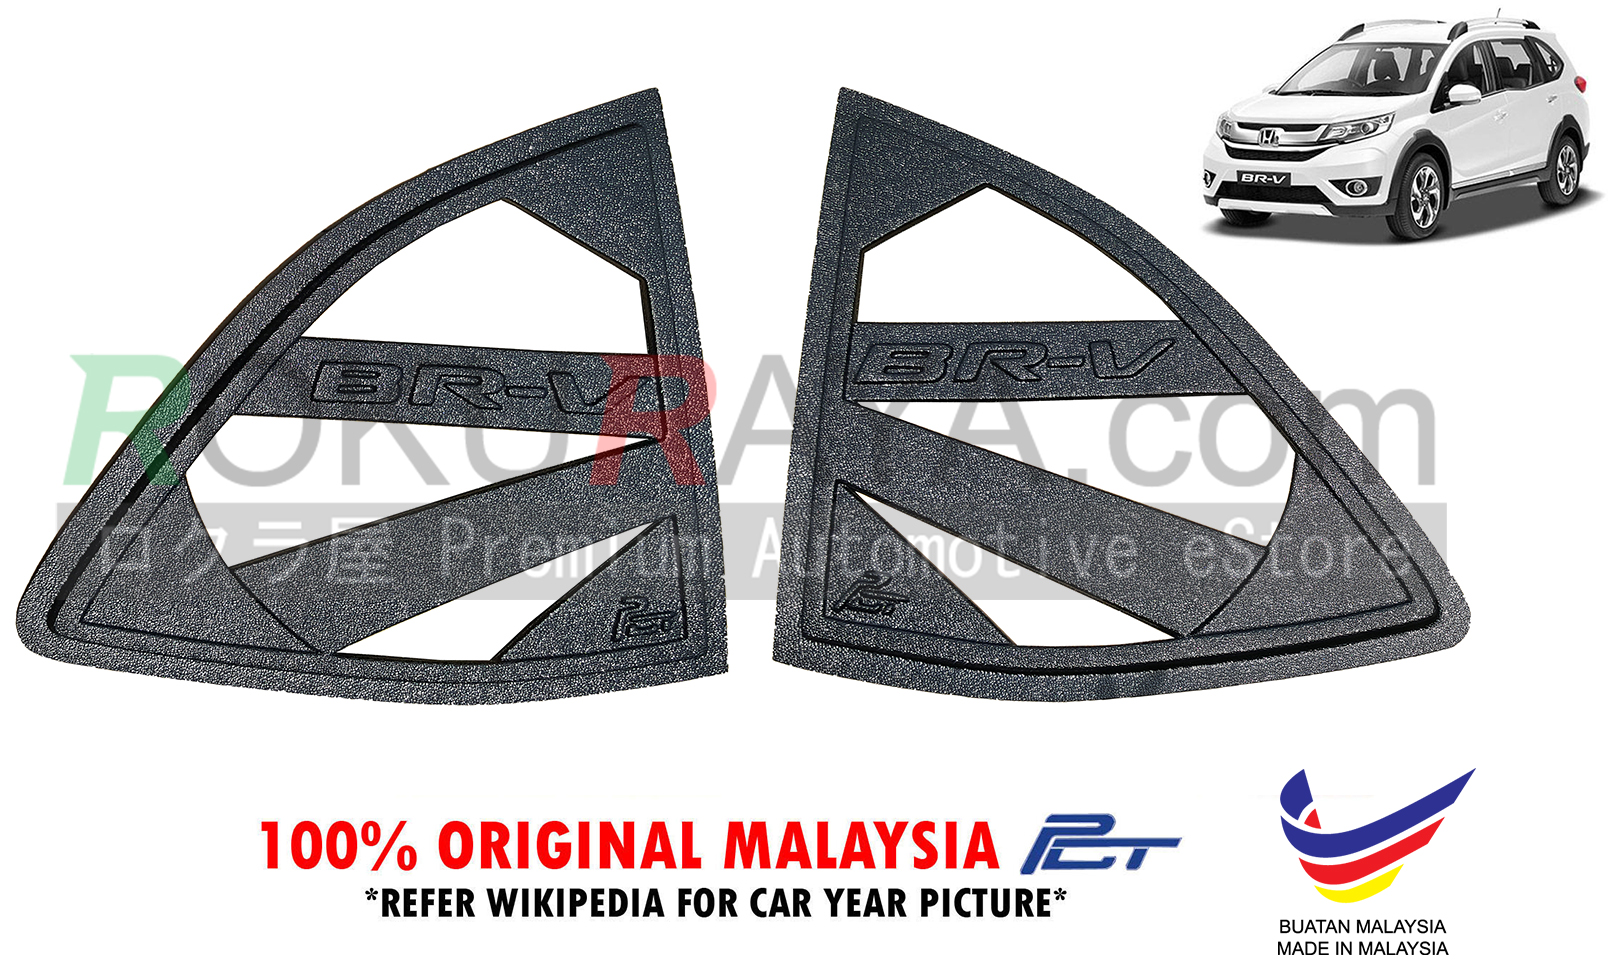 Honda Brv Br V 2015 Rear Triangle Side Window Mirror Cover